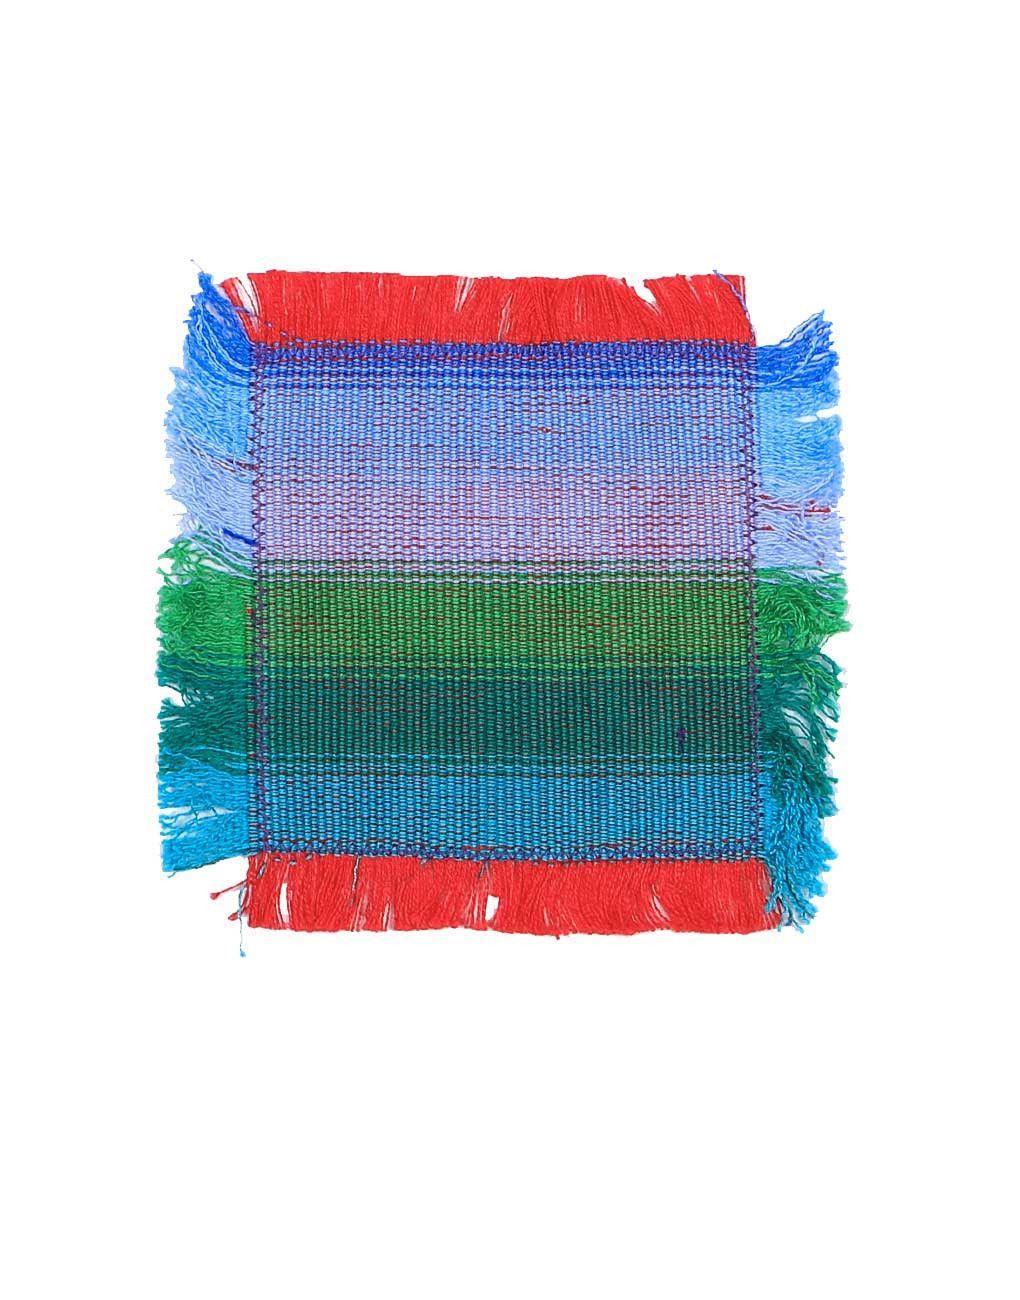 Coaster - Blue Ombre